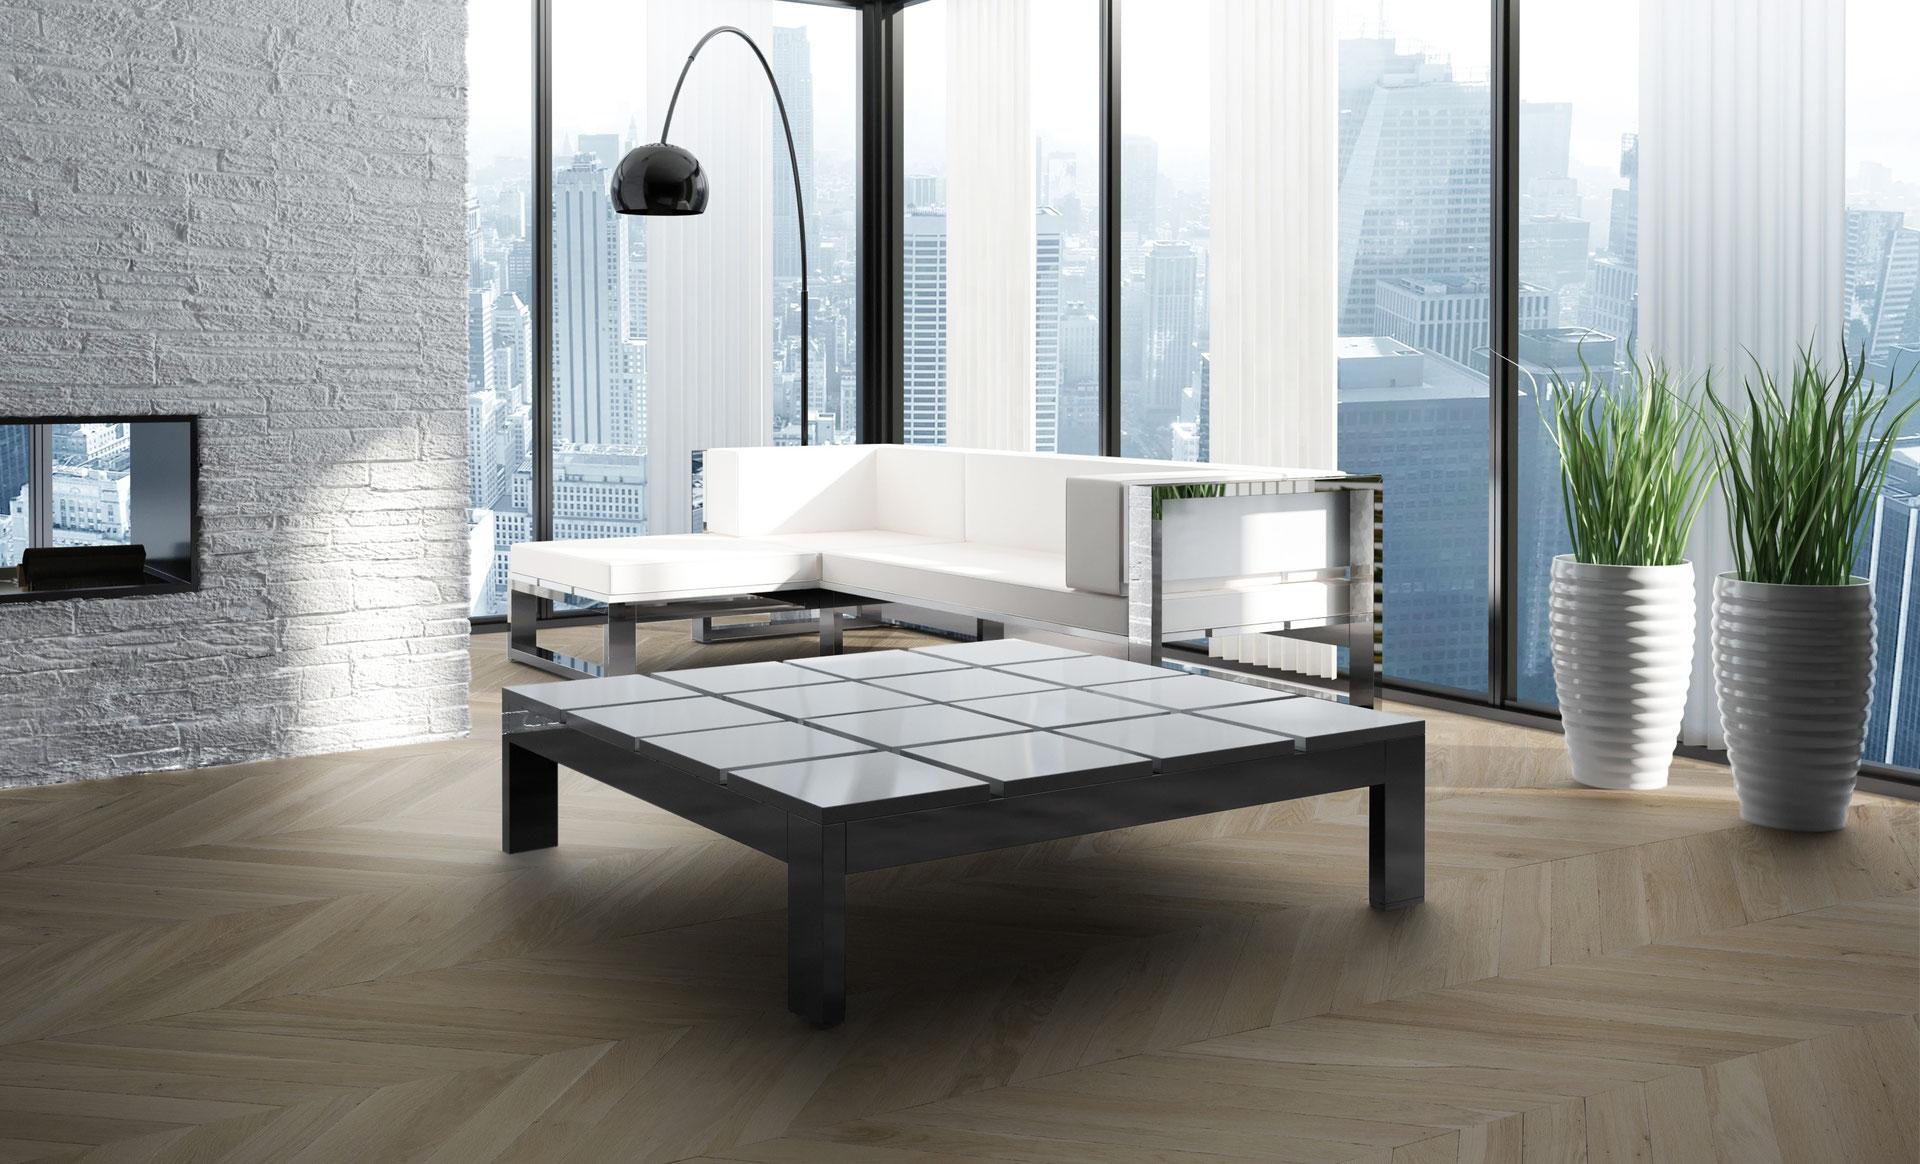 franz sisches fischgr t klick parkett s fischbacher living. Black Bedroom Furniture Sets. Home Design Ideas